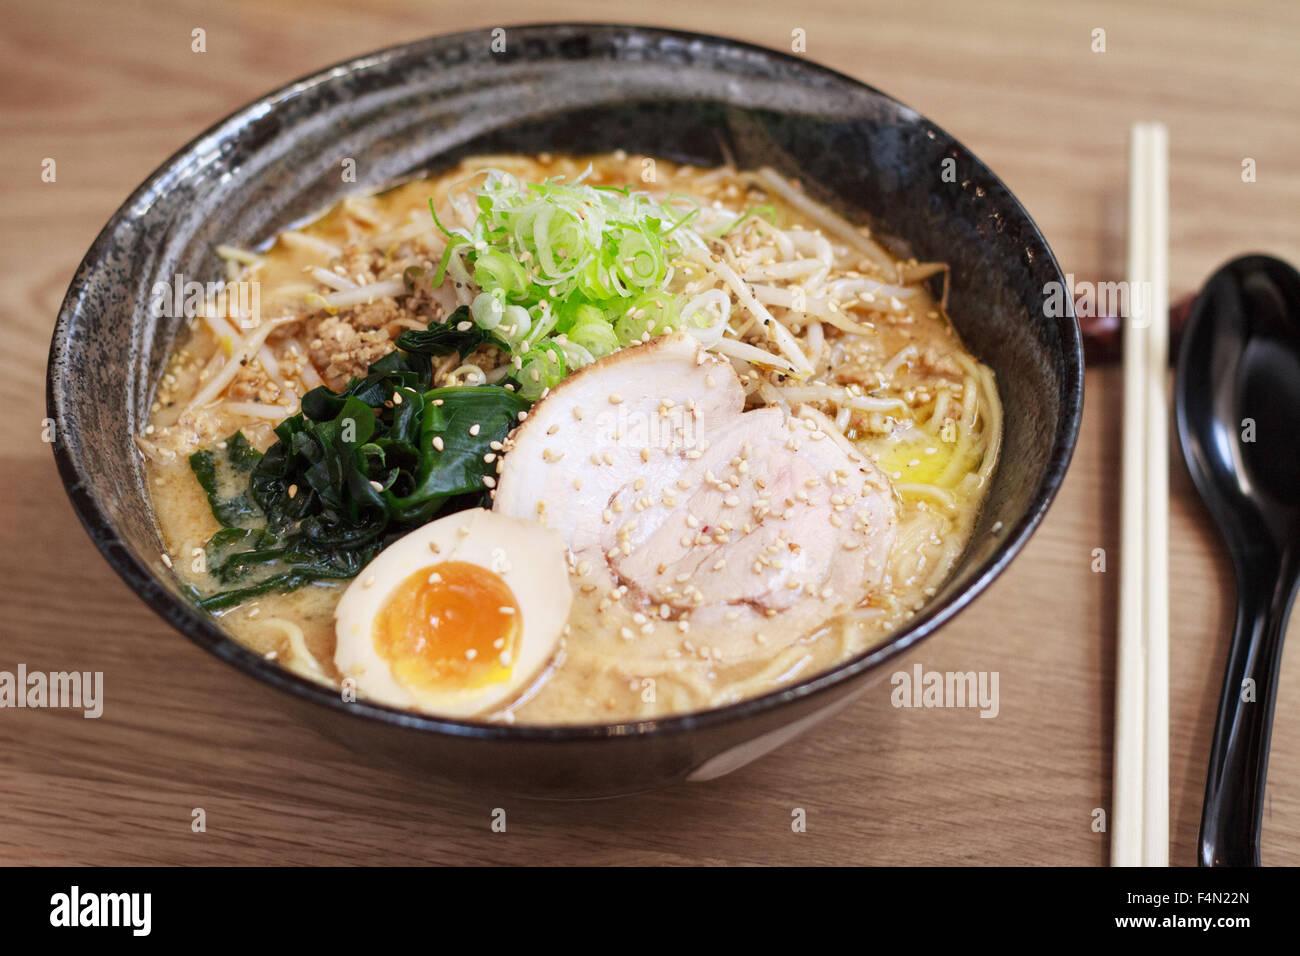 Japanese Miso based Ramen noodles - Stock Image